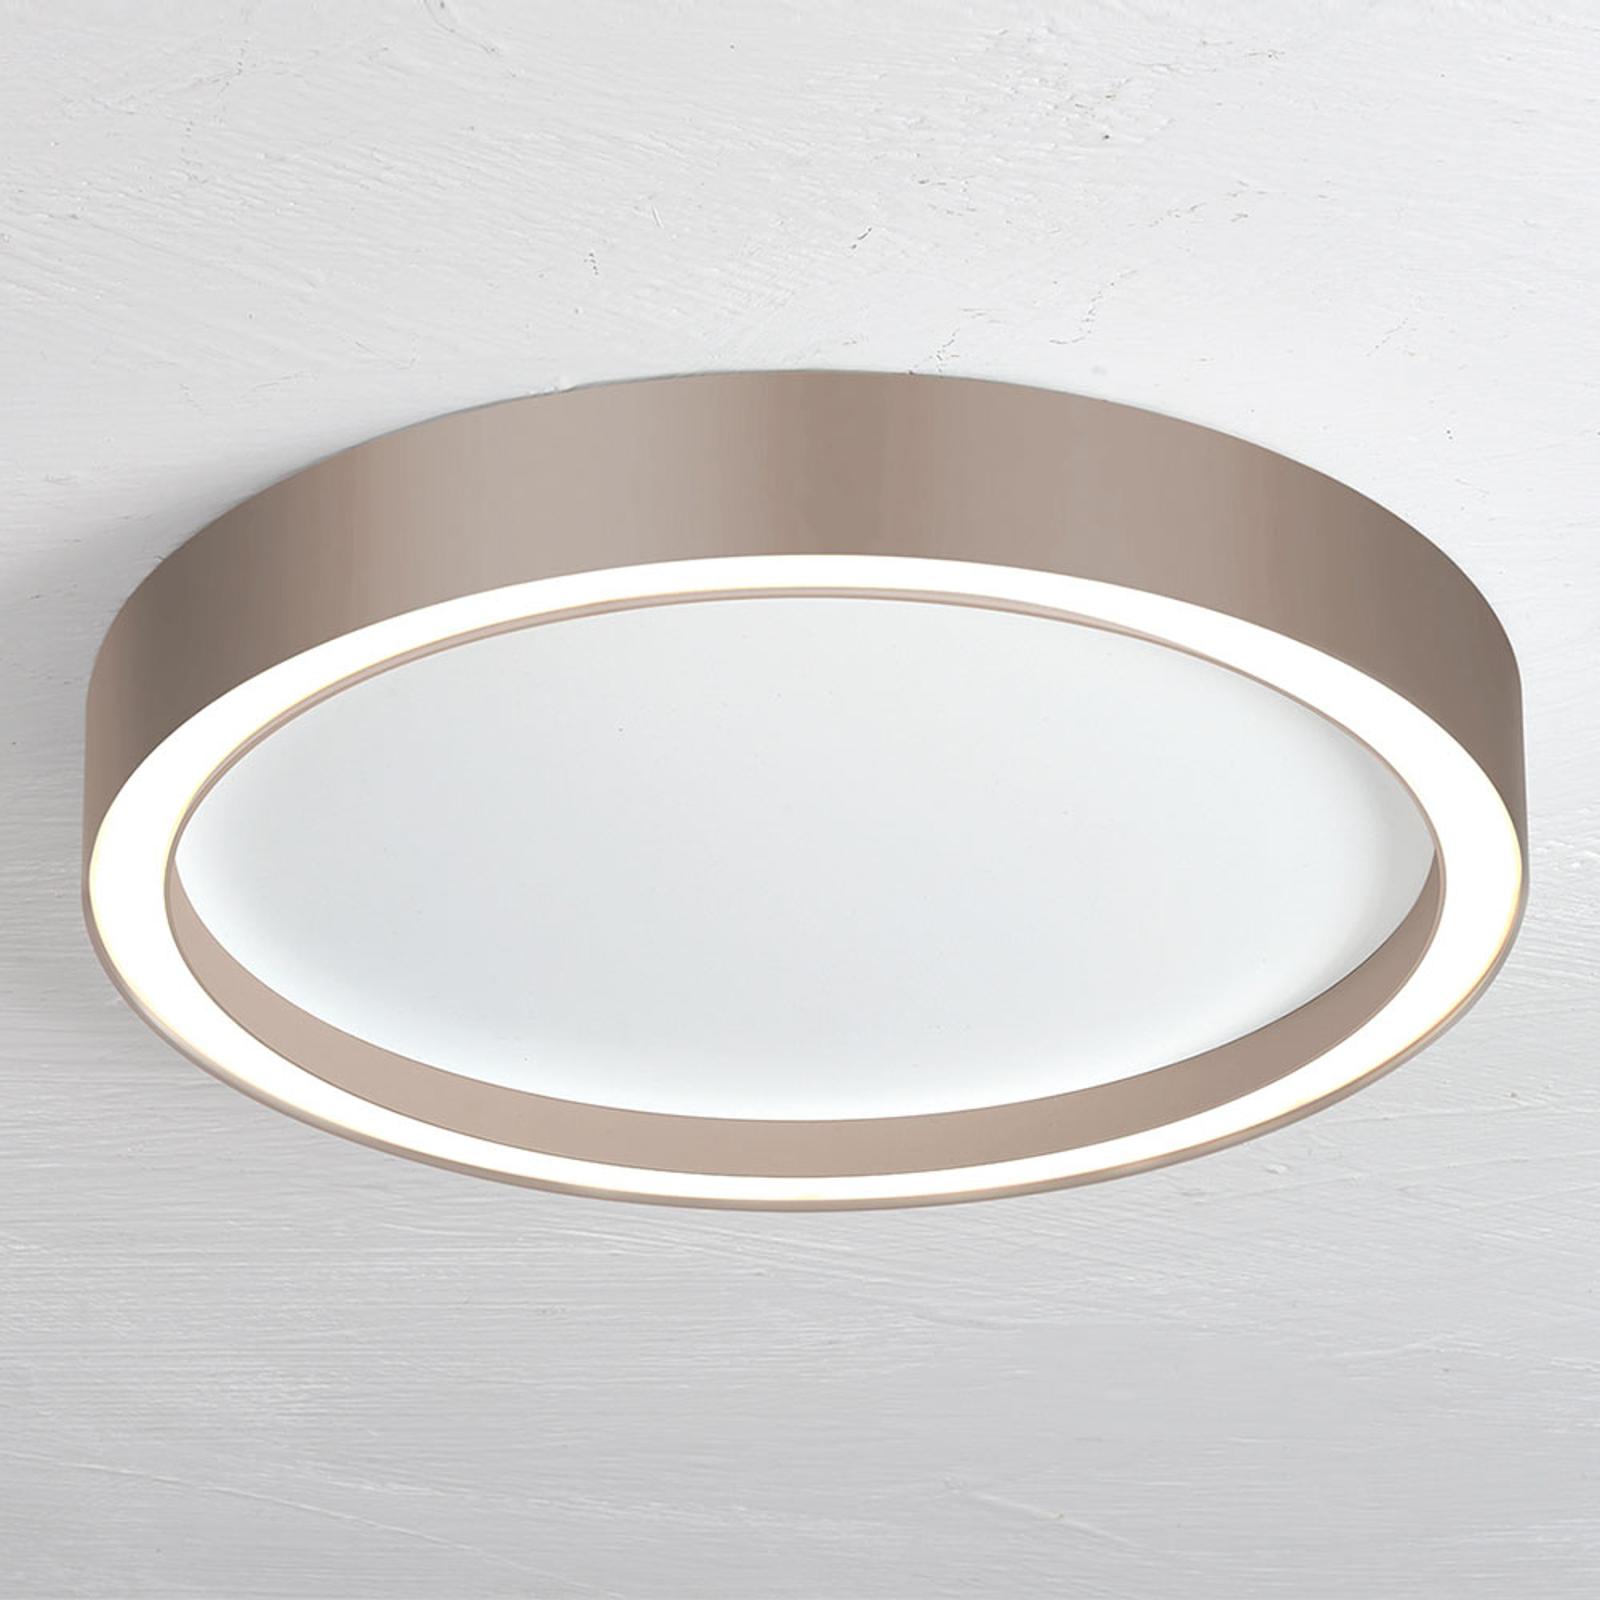 Bopp Aura LED plafondlamp Ø 40cm wit/taupe